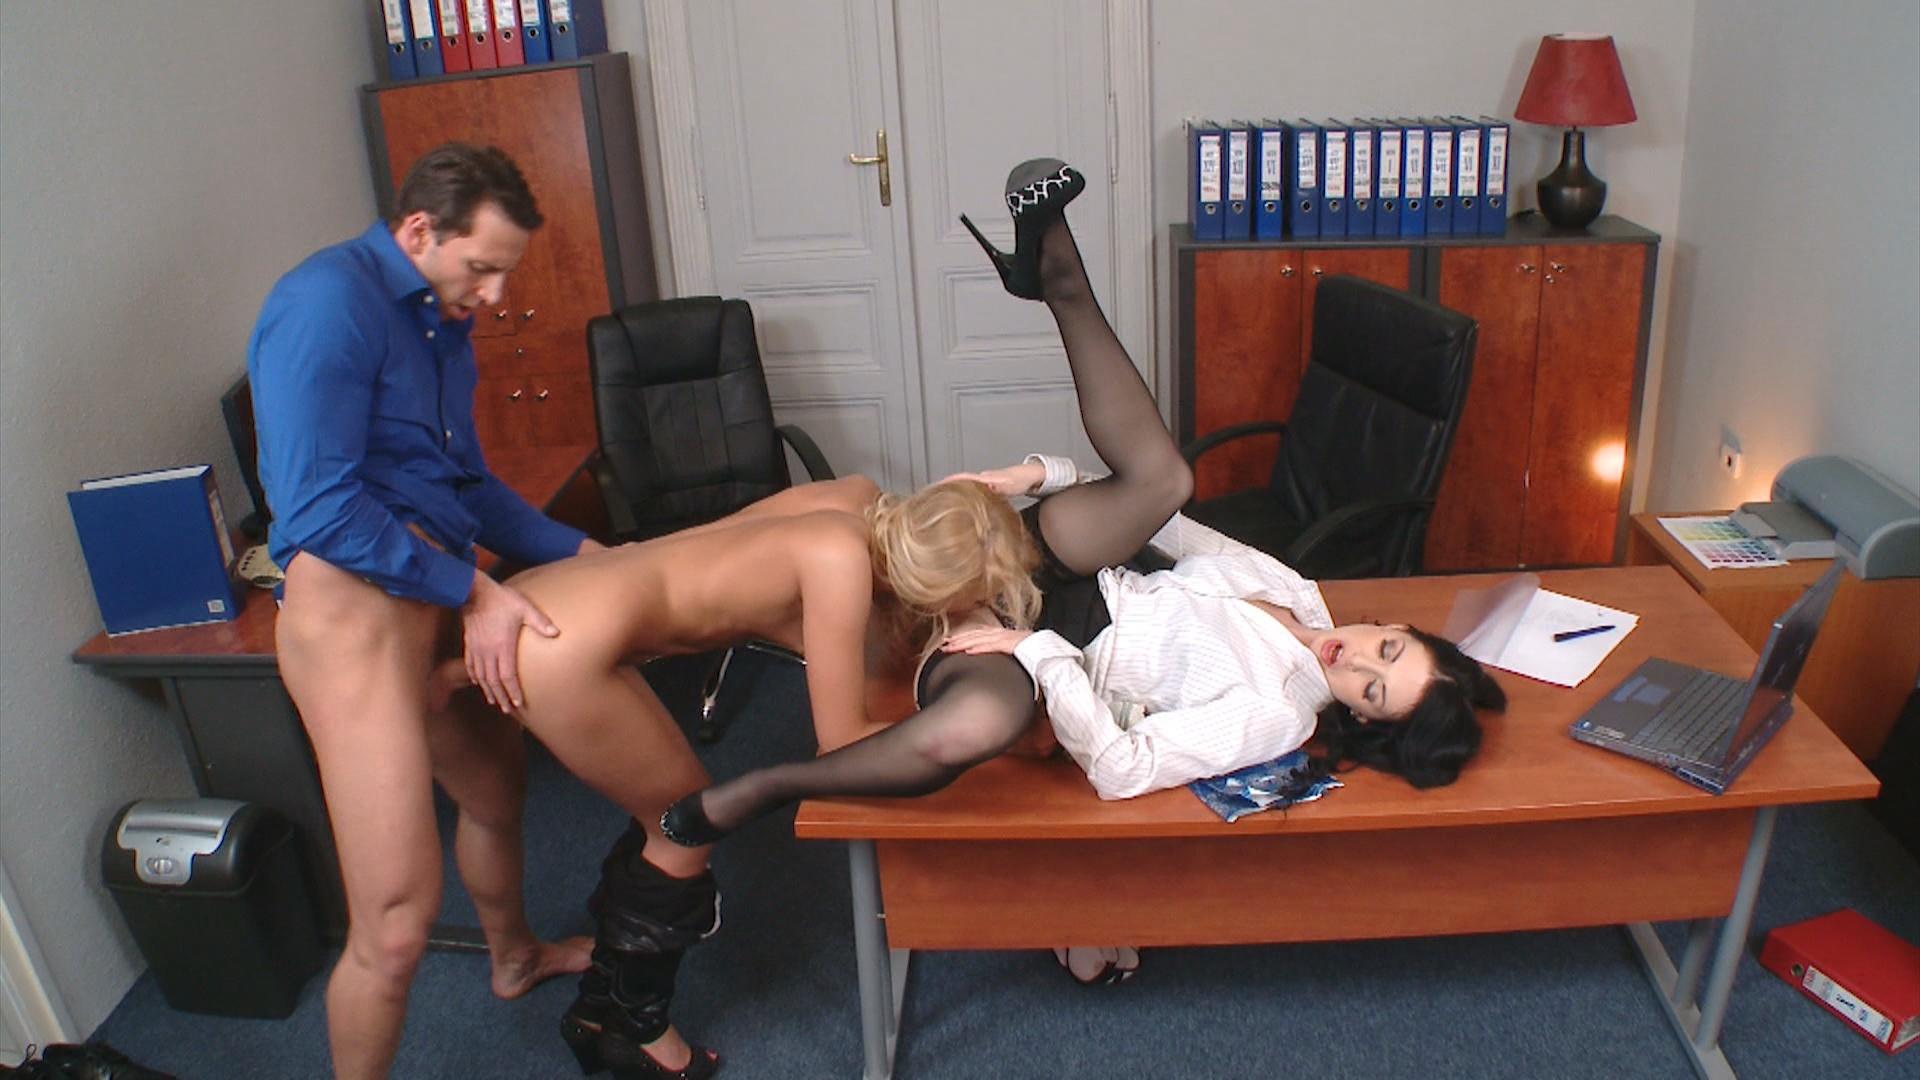 Ivana Sugar The Russian Porn Star xvideos